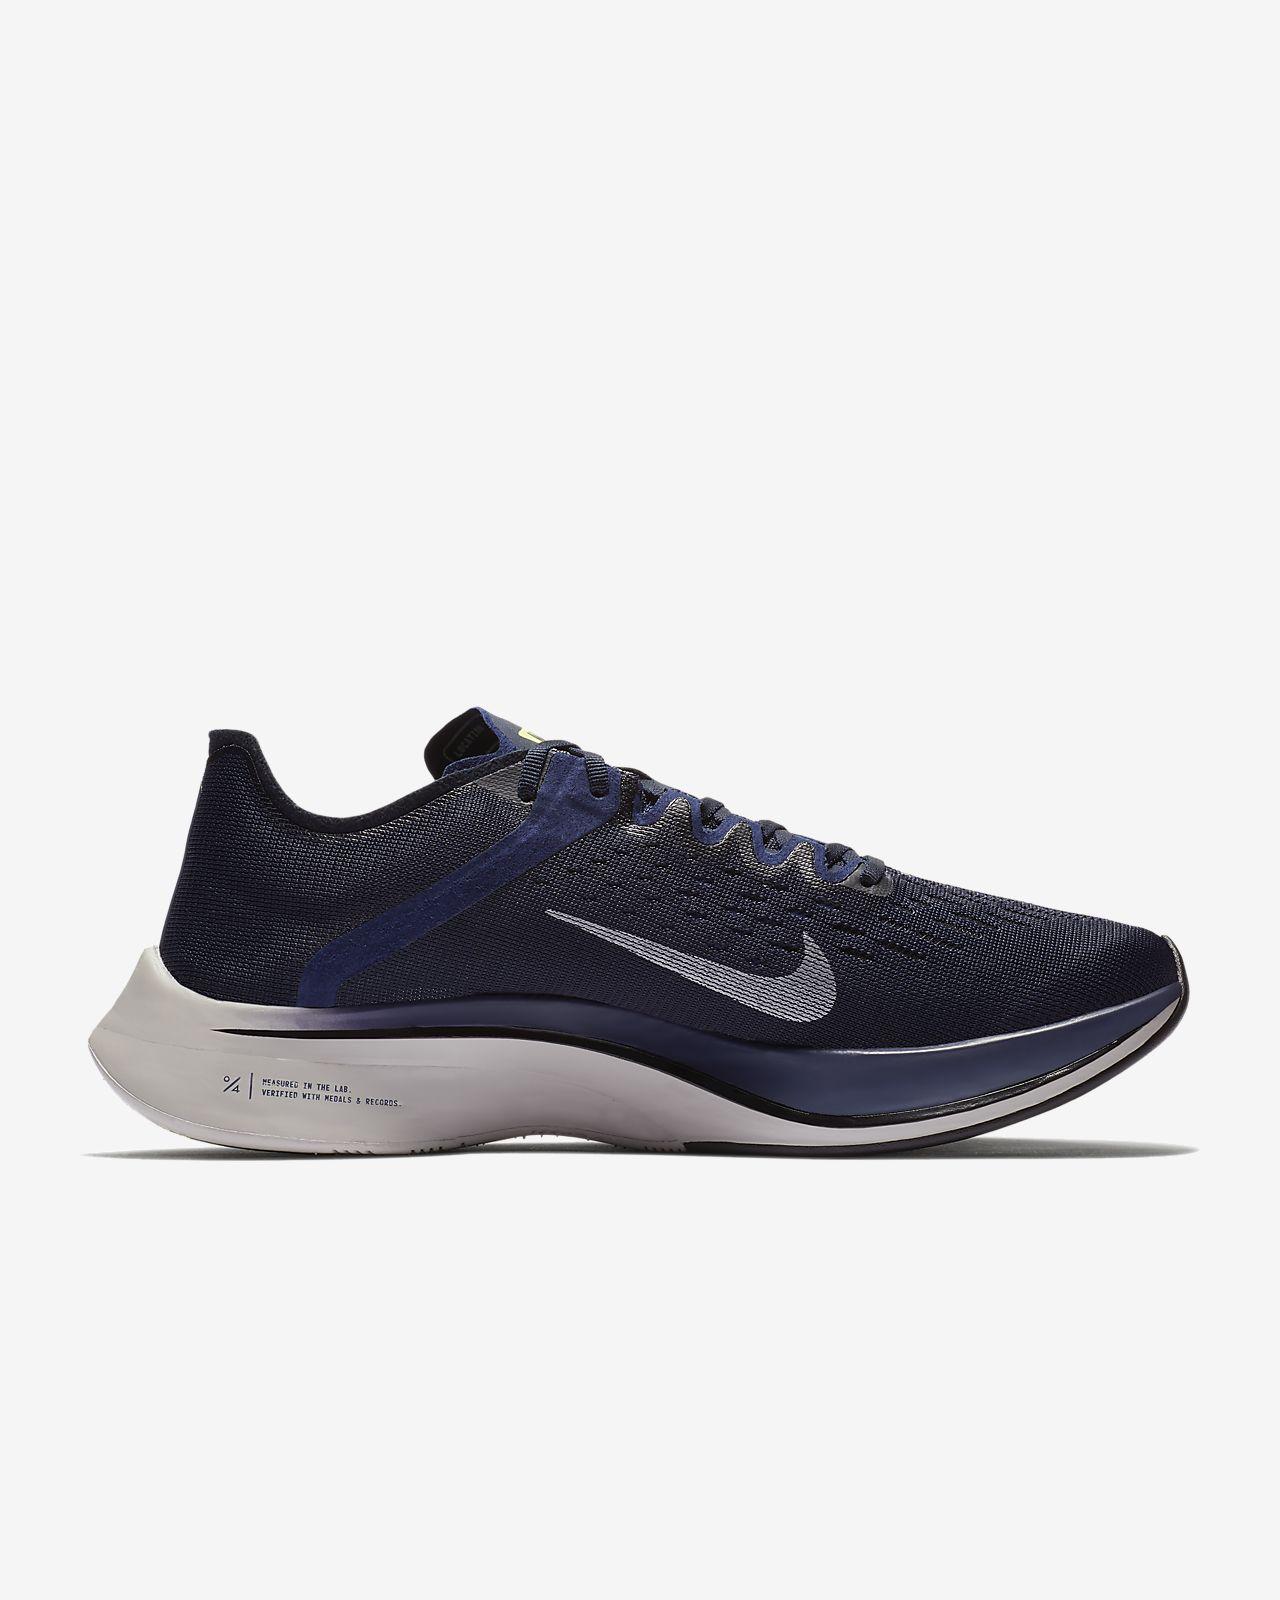 Chaussure de running mixte Nike Zoom Vaporfly 4%